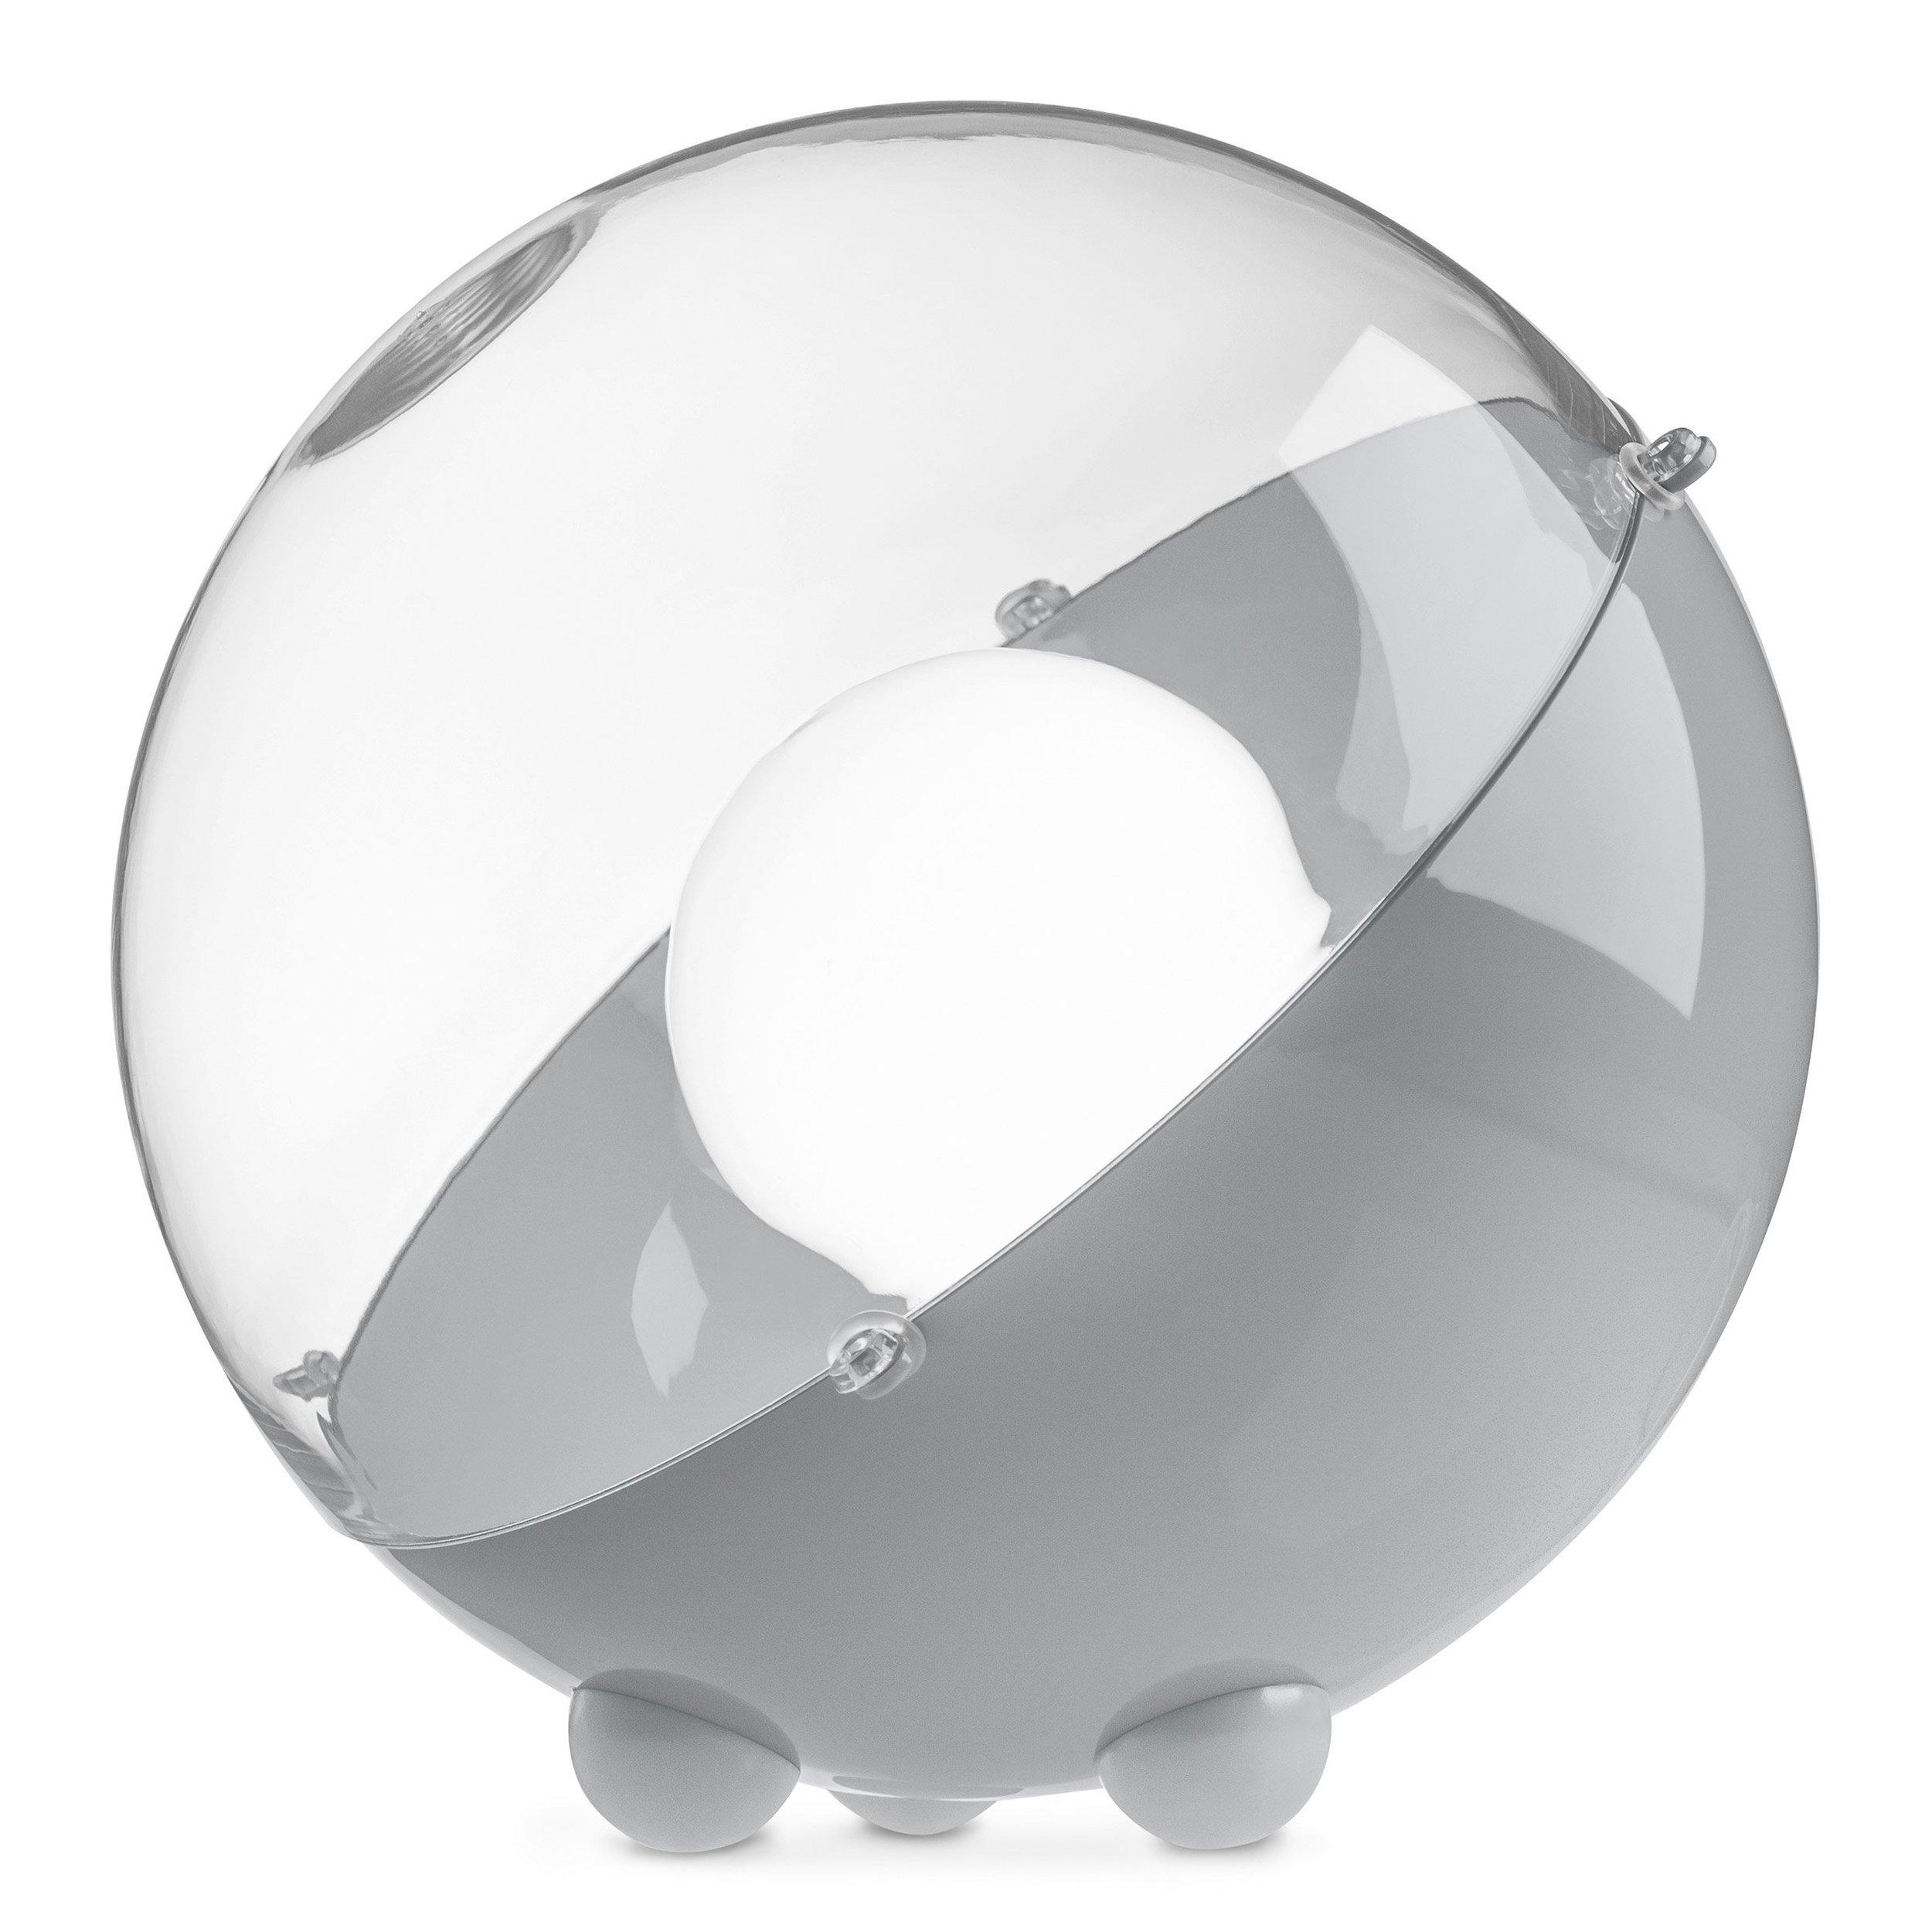 Lampa podłogowa Orion szara